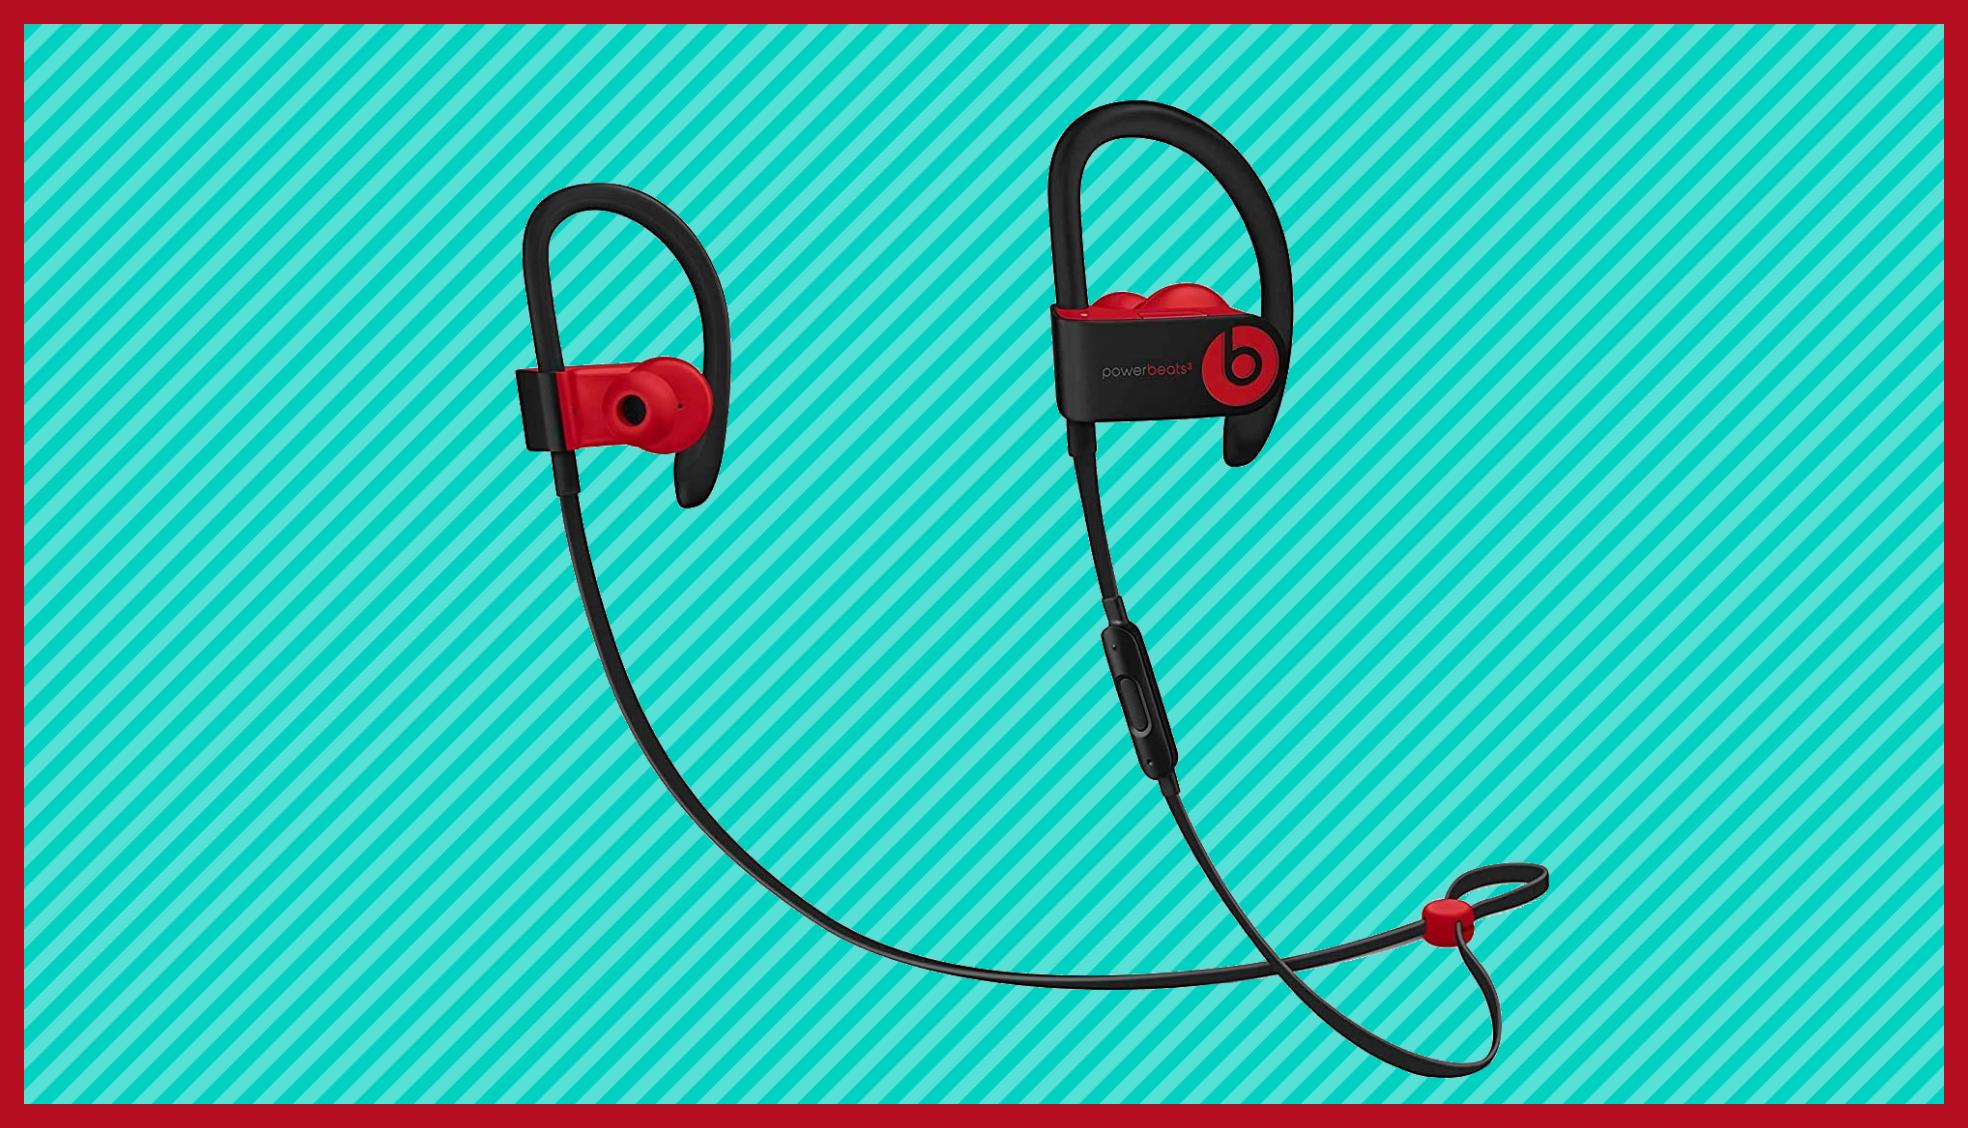 Powerbeats3 Wireless In Ear Headphones Are On Sale At Amazon